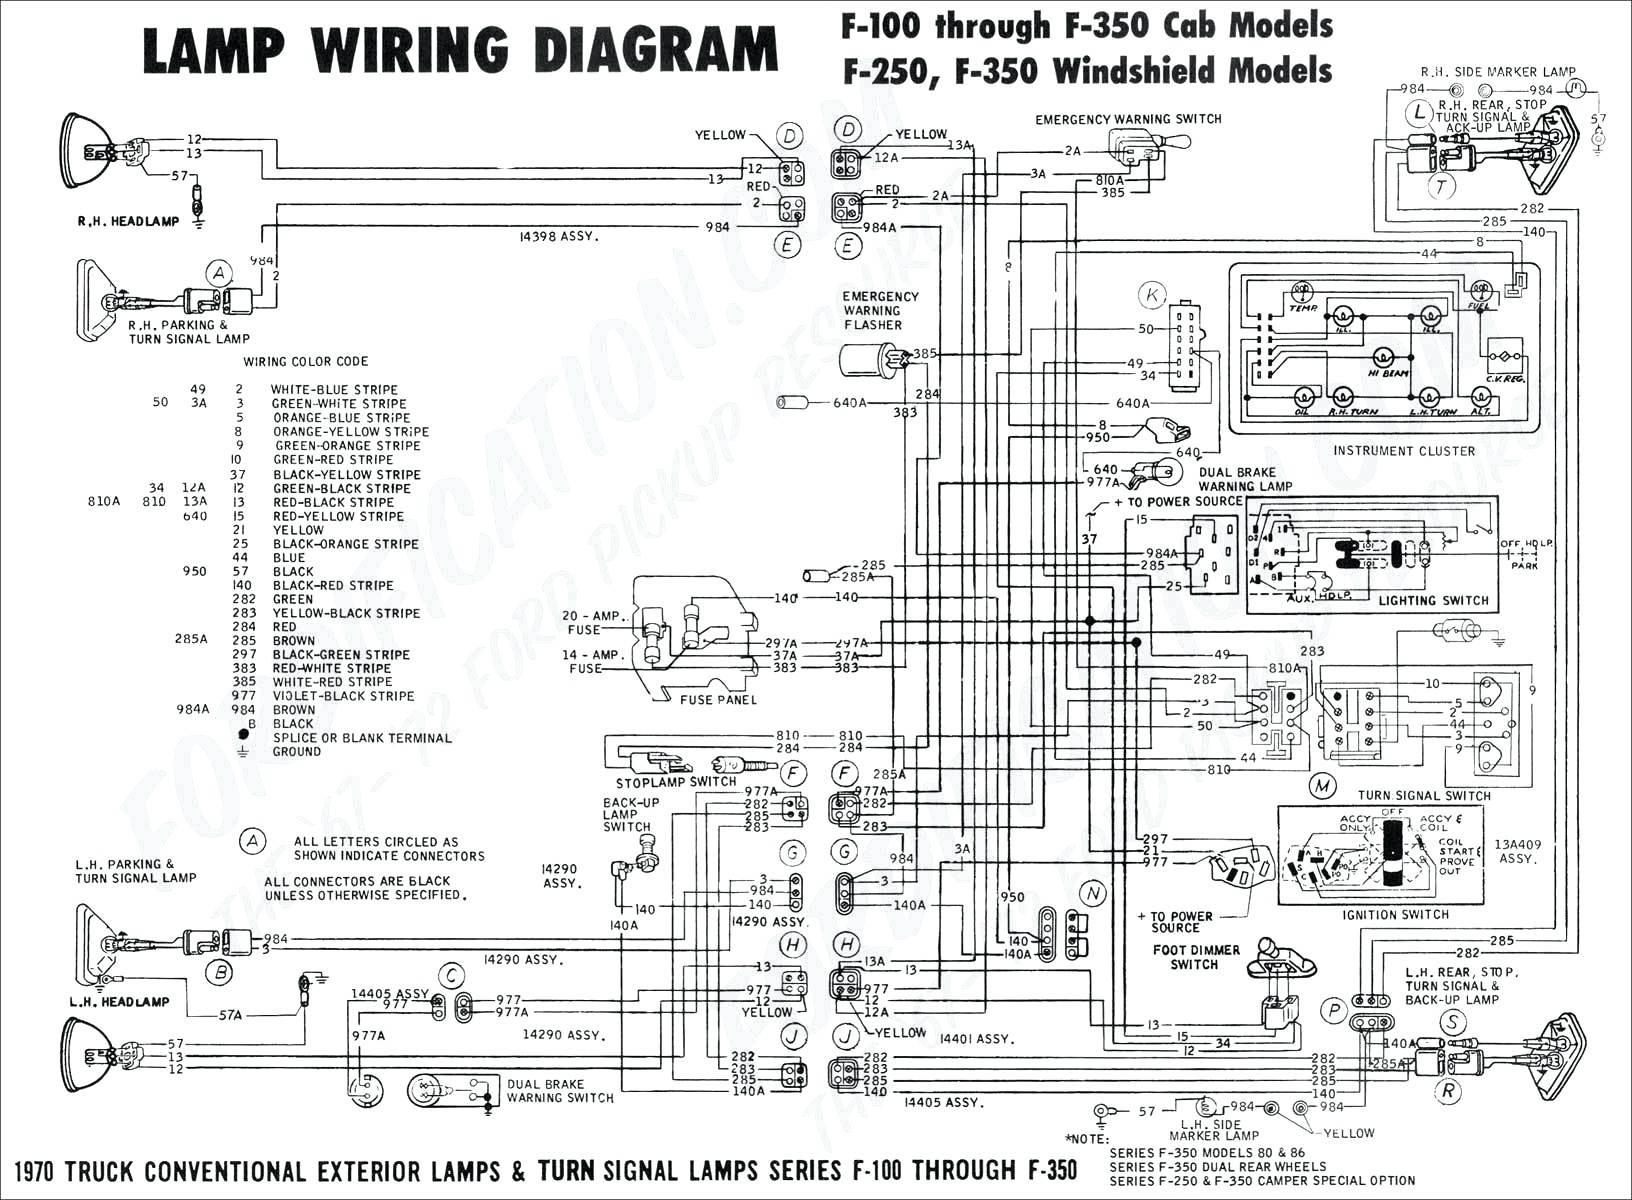 1998 Nissan Maxima Engine Diagram 1995 Nissan Maxima Engine Diagram Experts Wiring Diagram •